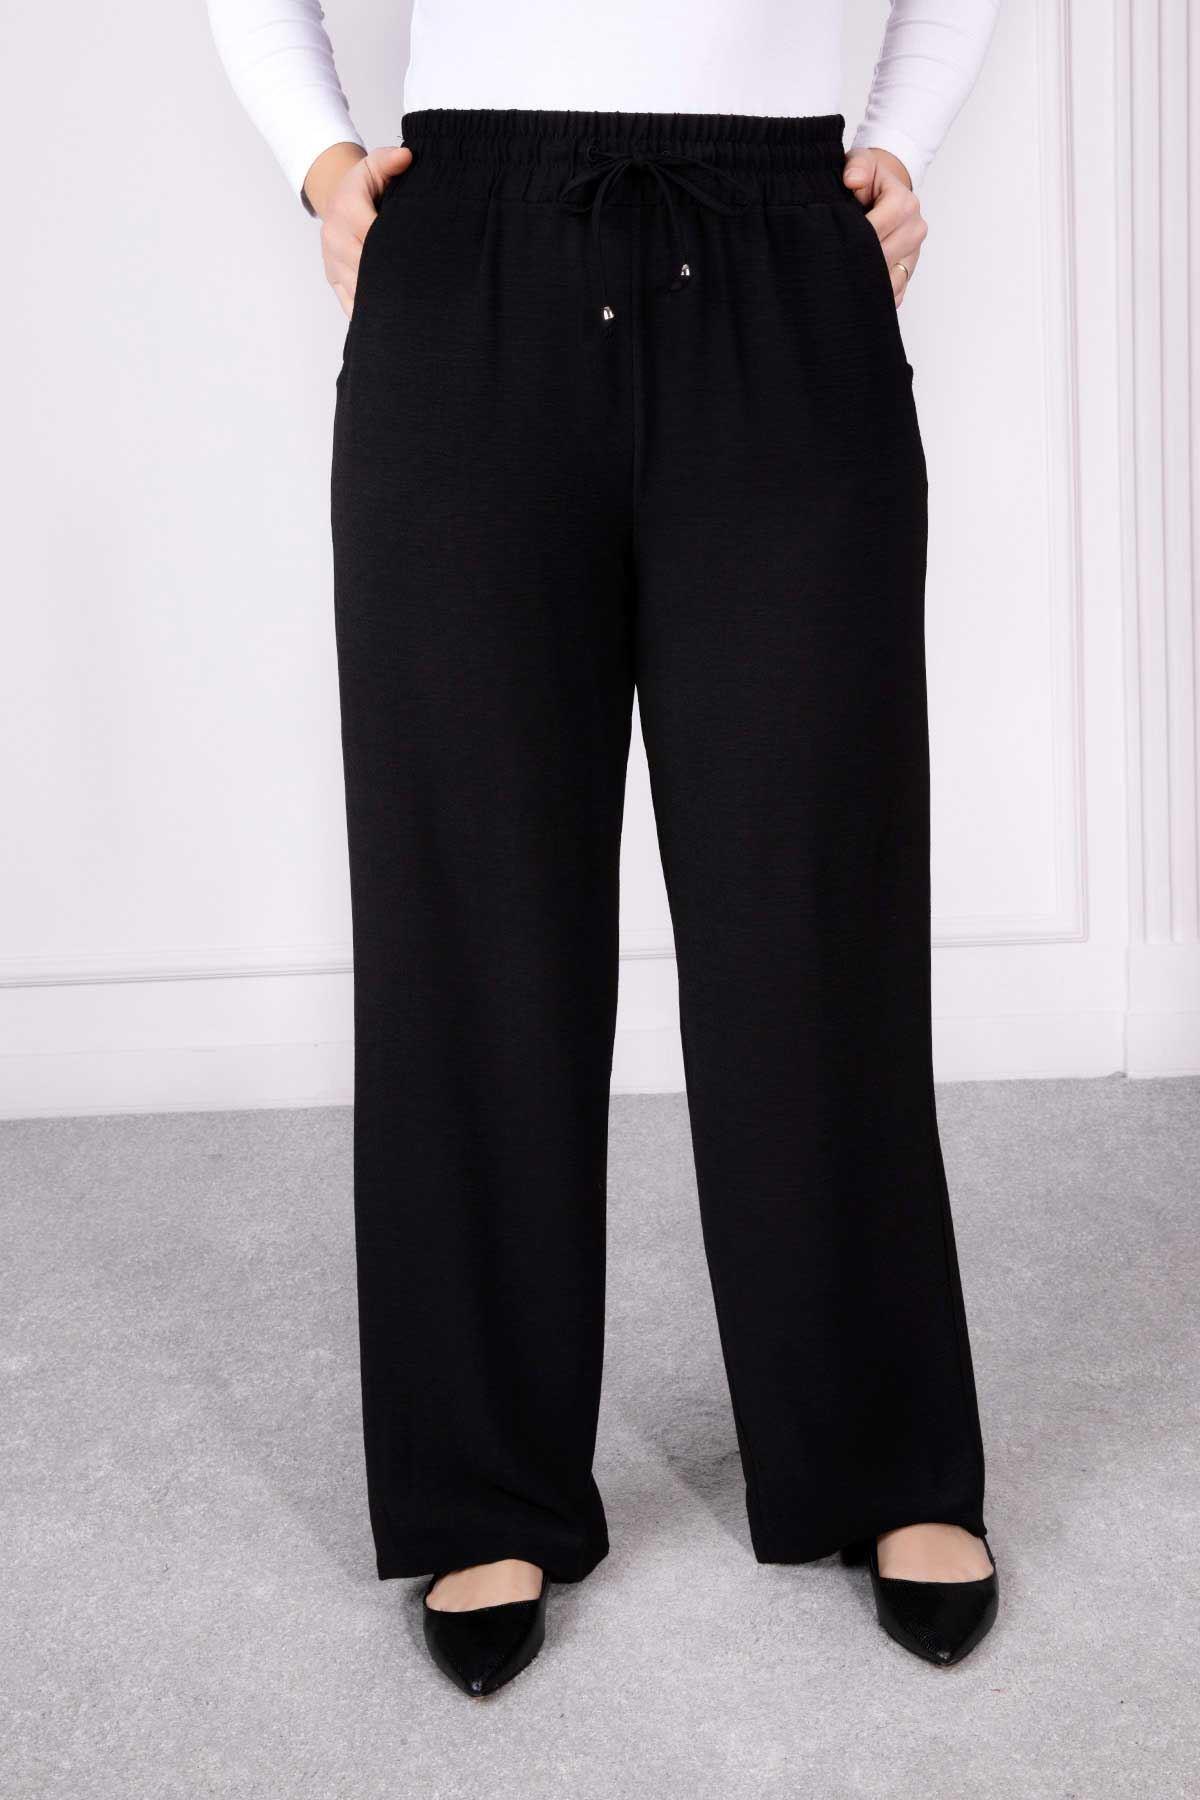 Bel Lastikli Bol Paça Pantolon Siyah 2209-32